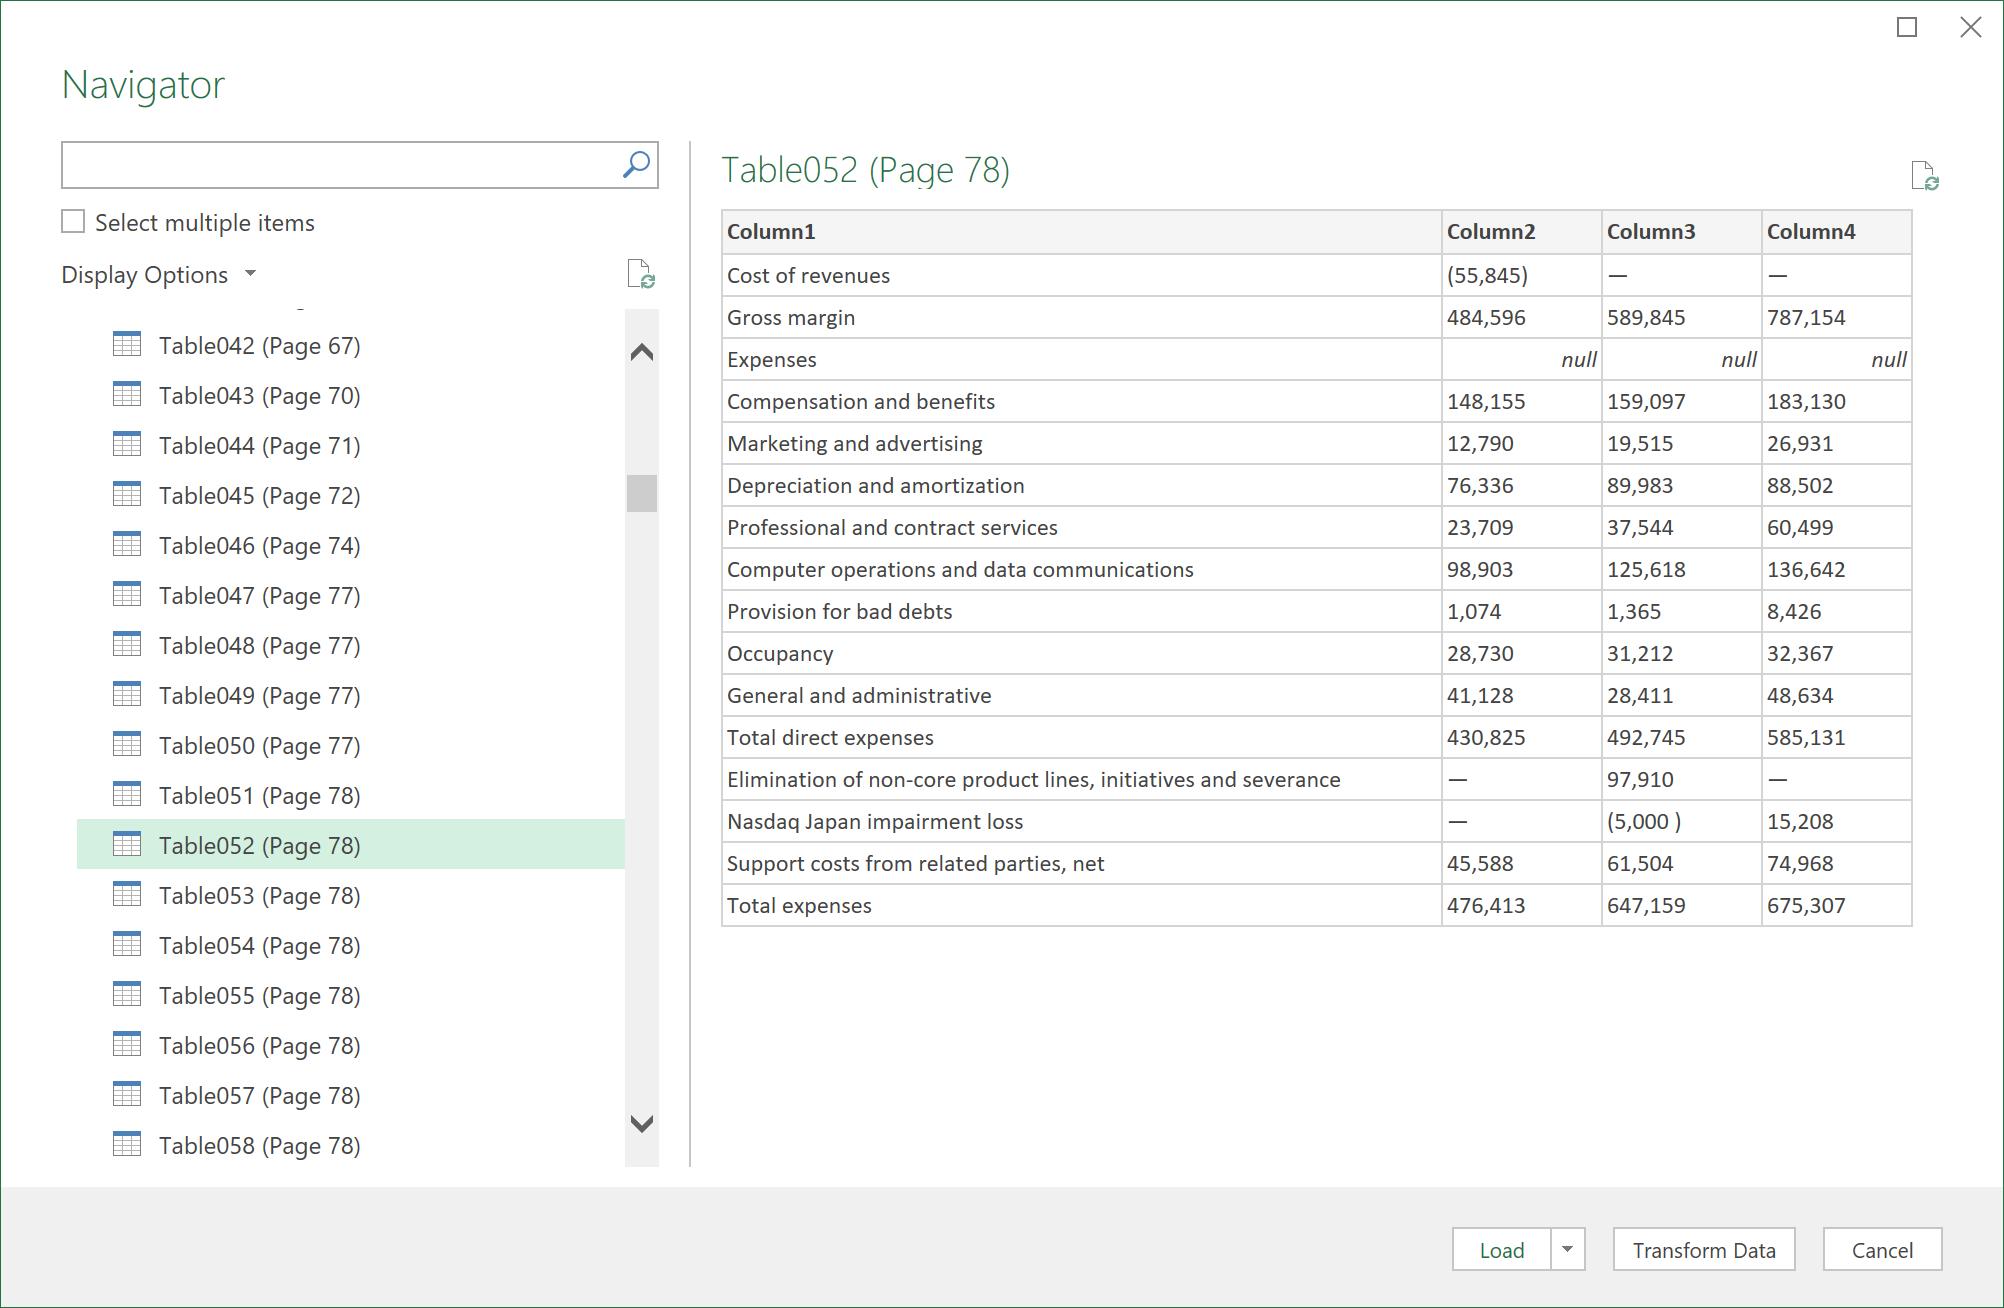 Cuadro de diálogo Navegador para importar datos PDF